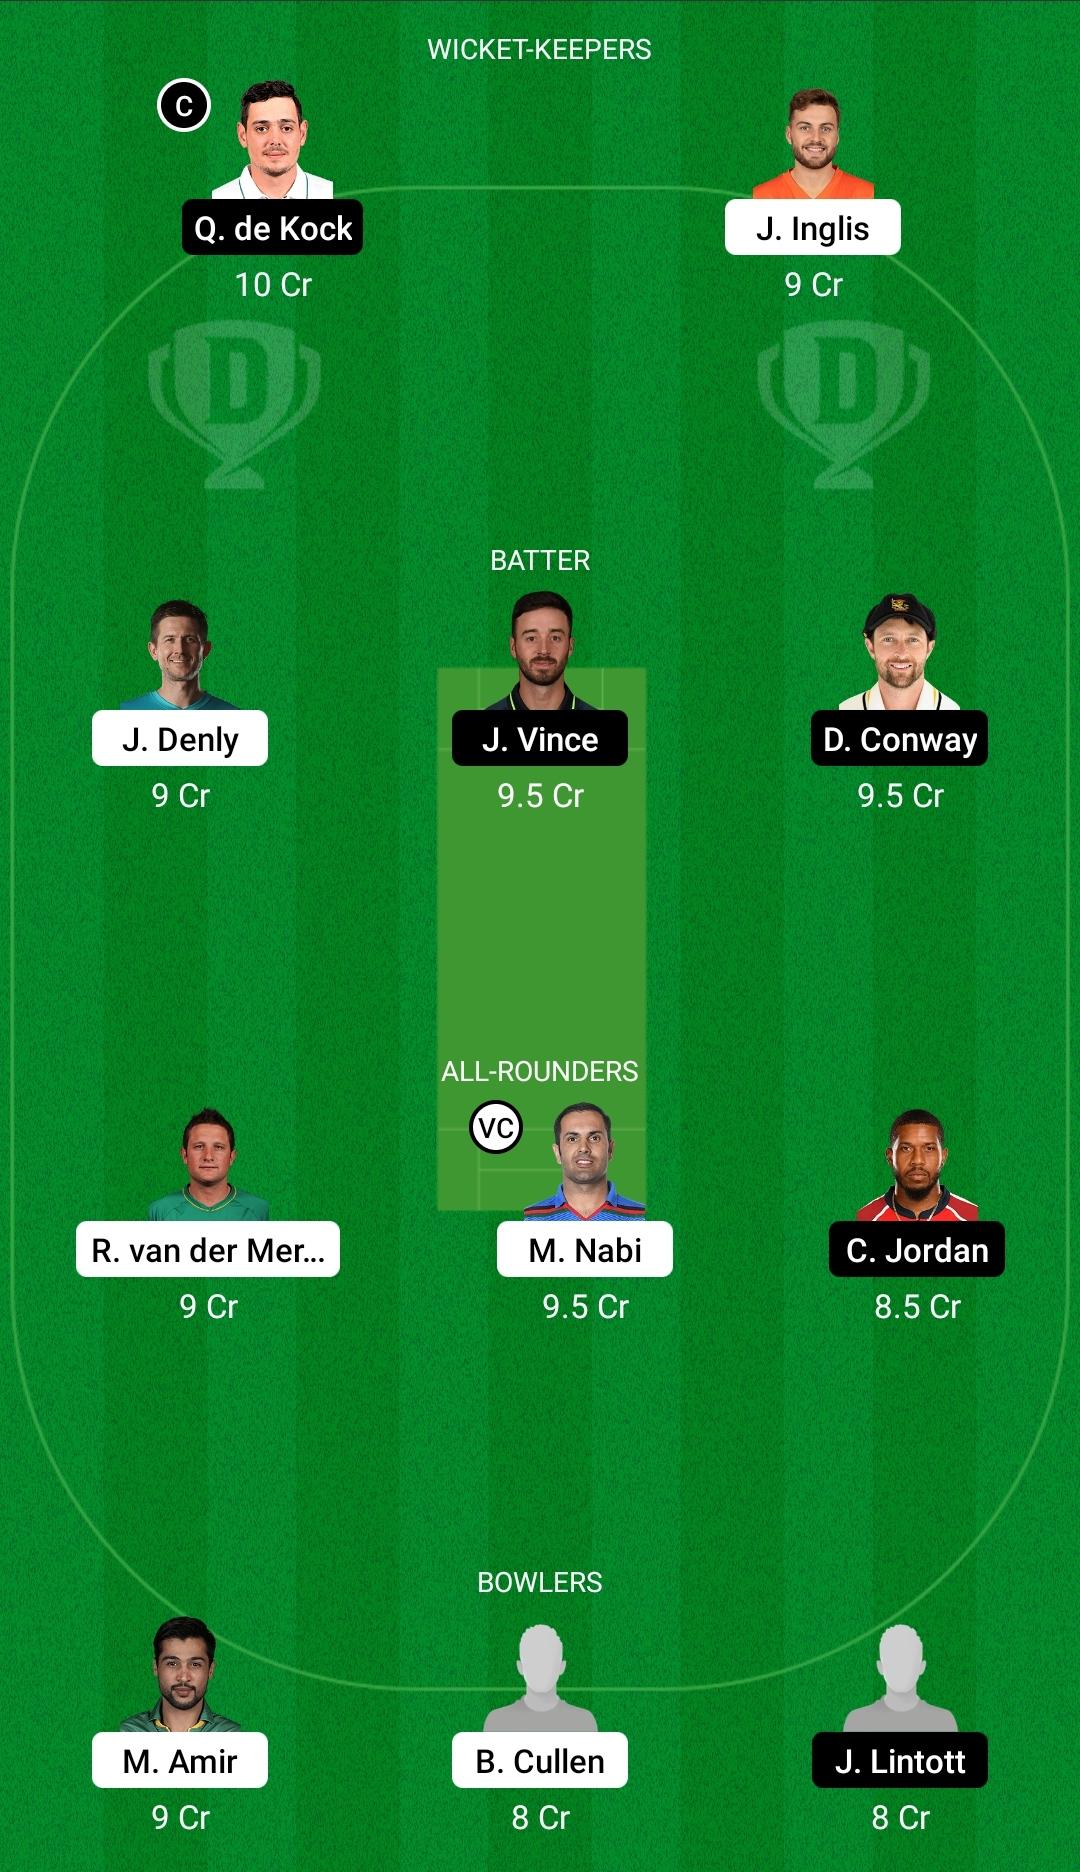 LNS vs SOB Dream11 Prediction Fantasy Cricket Tips Dream11 Team The Hundred Men